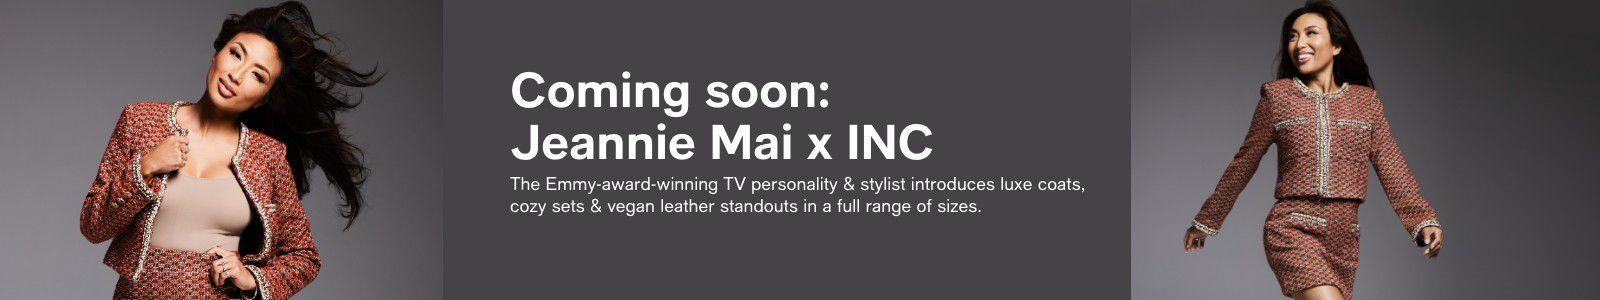 Coming soon, Jennie Mai X Inc